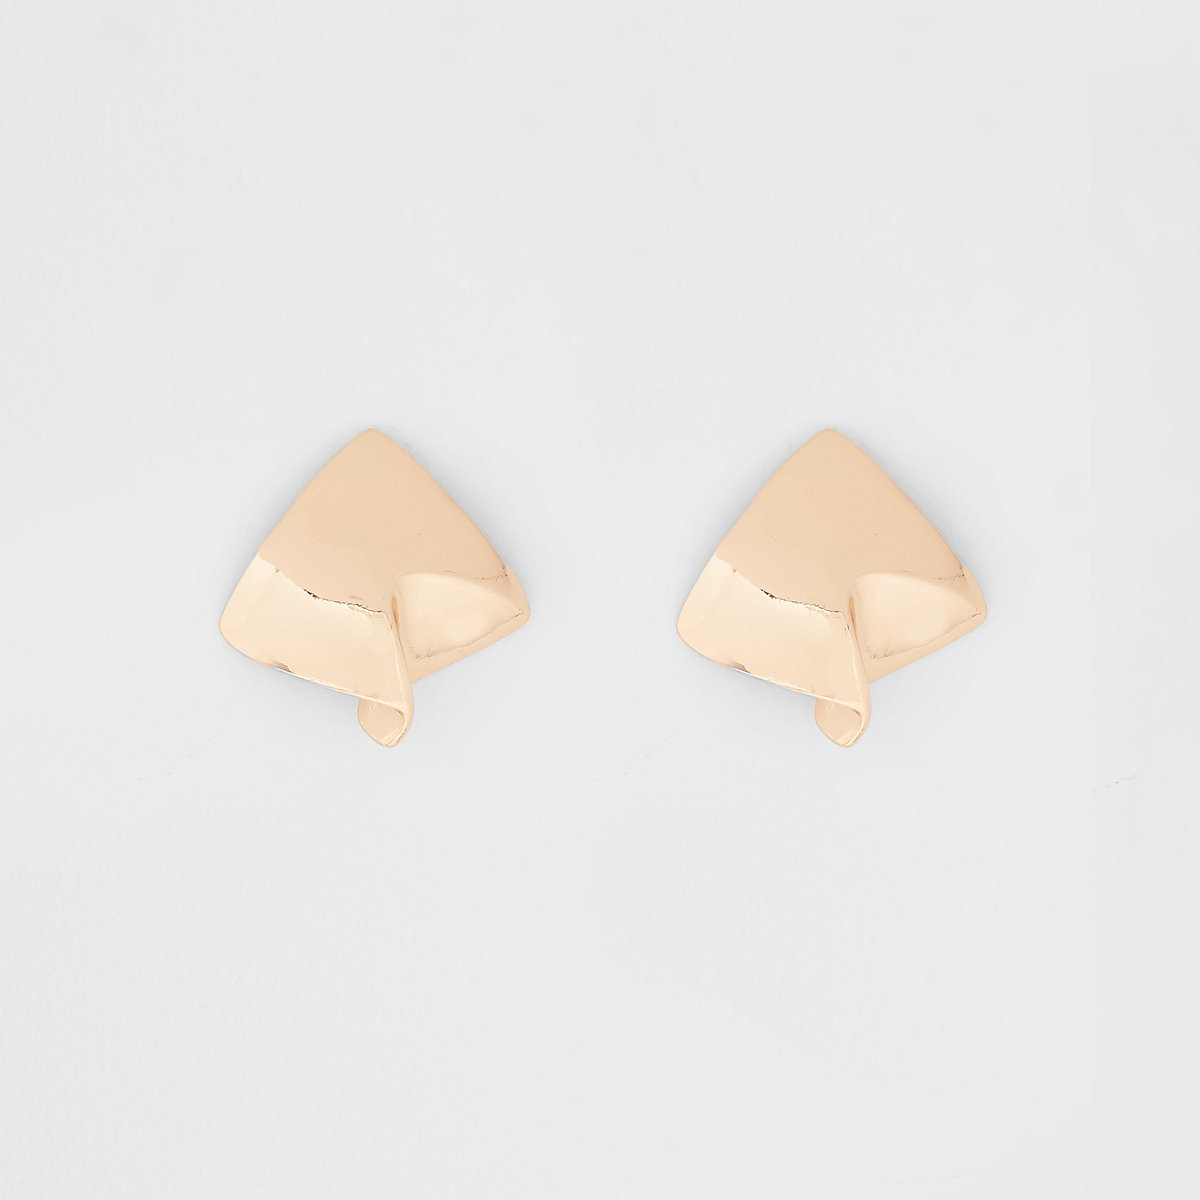 Gold tone square folded stud earrings